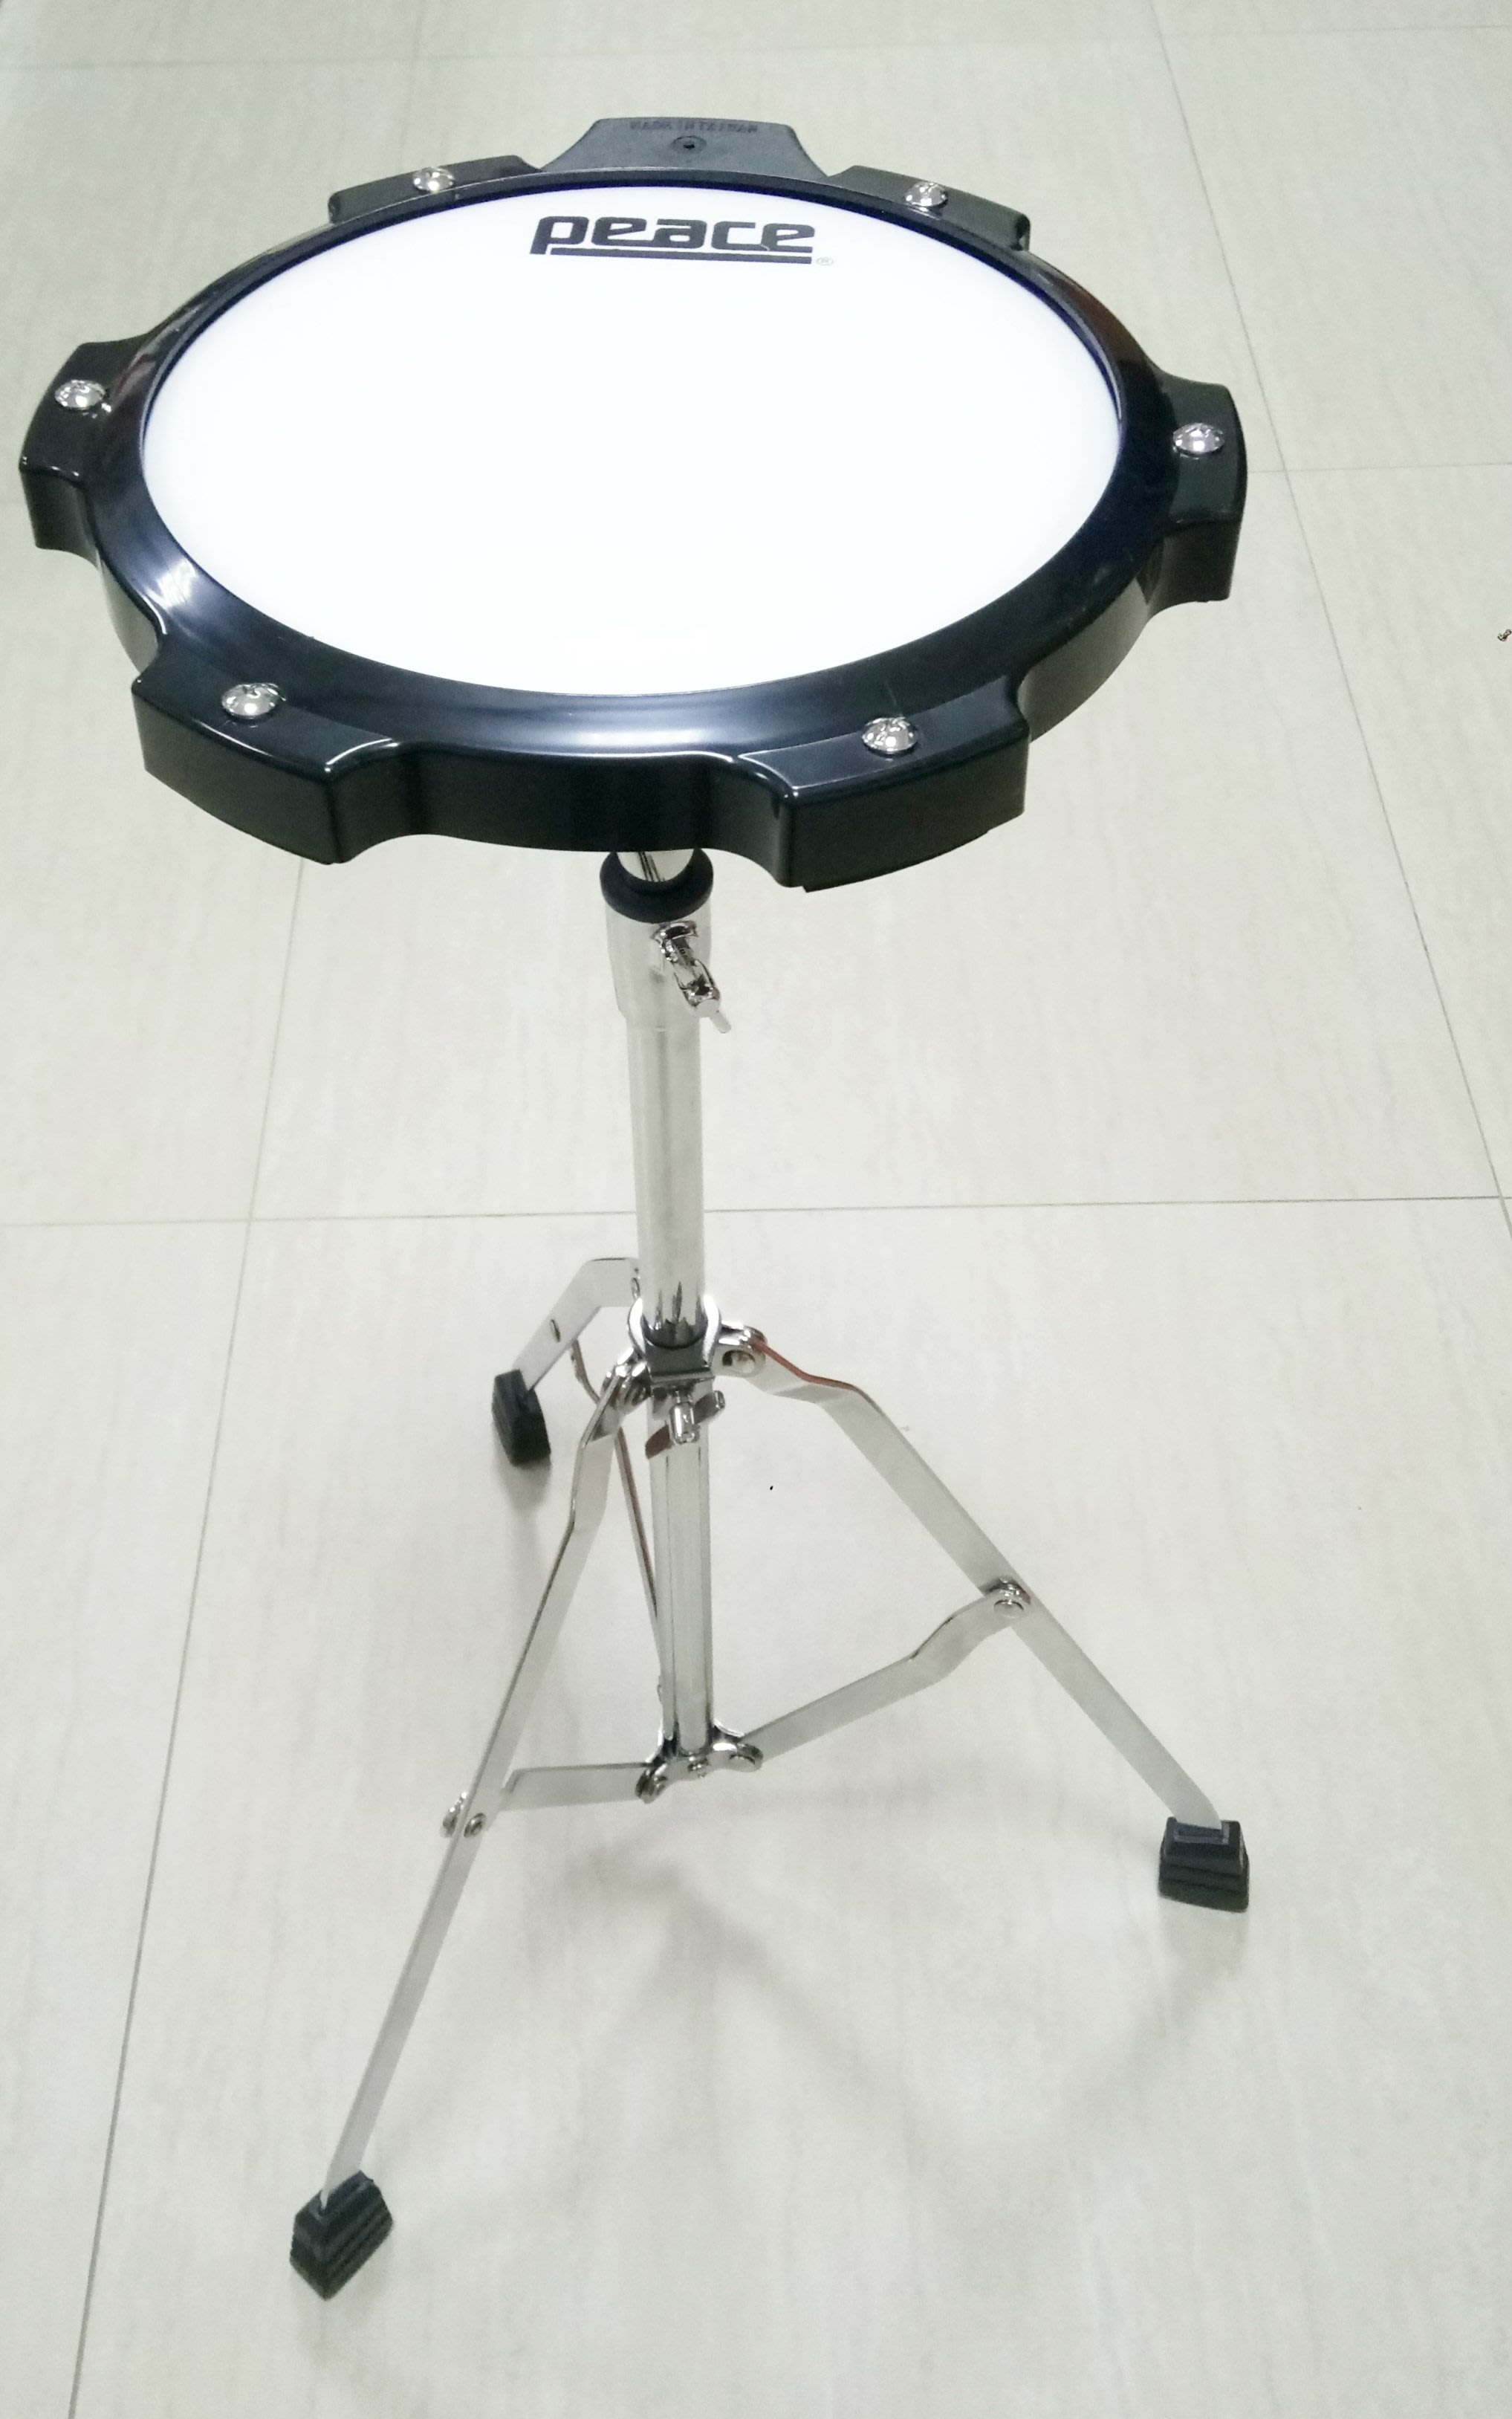 PEACE 8吋 爵士鼓打擊練習板+腳架 打點板 打擊墊 打擊板 台灣製造 【樂器城堡】